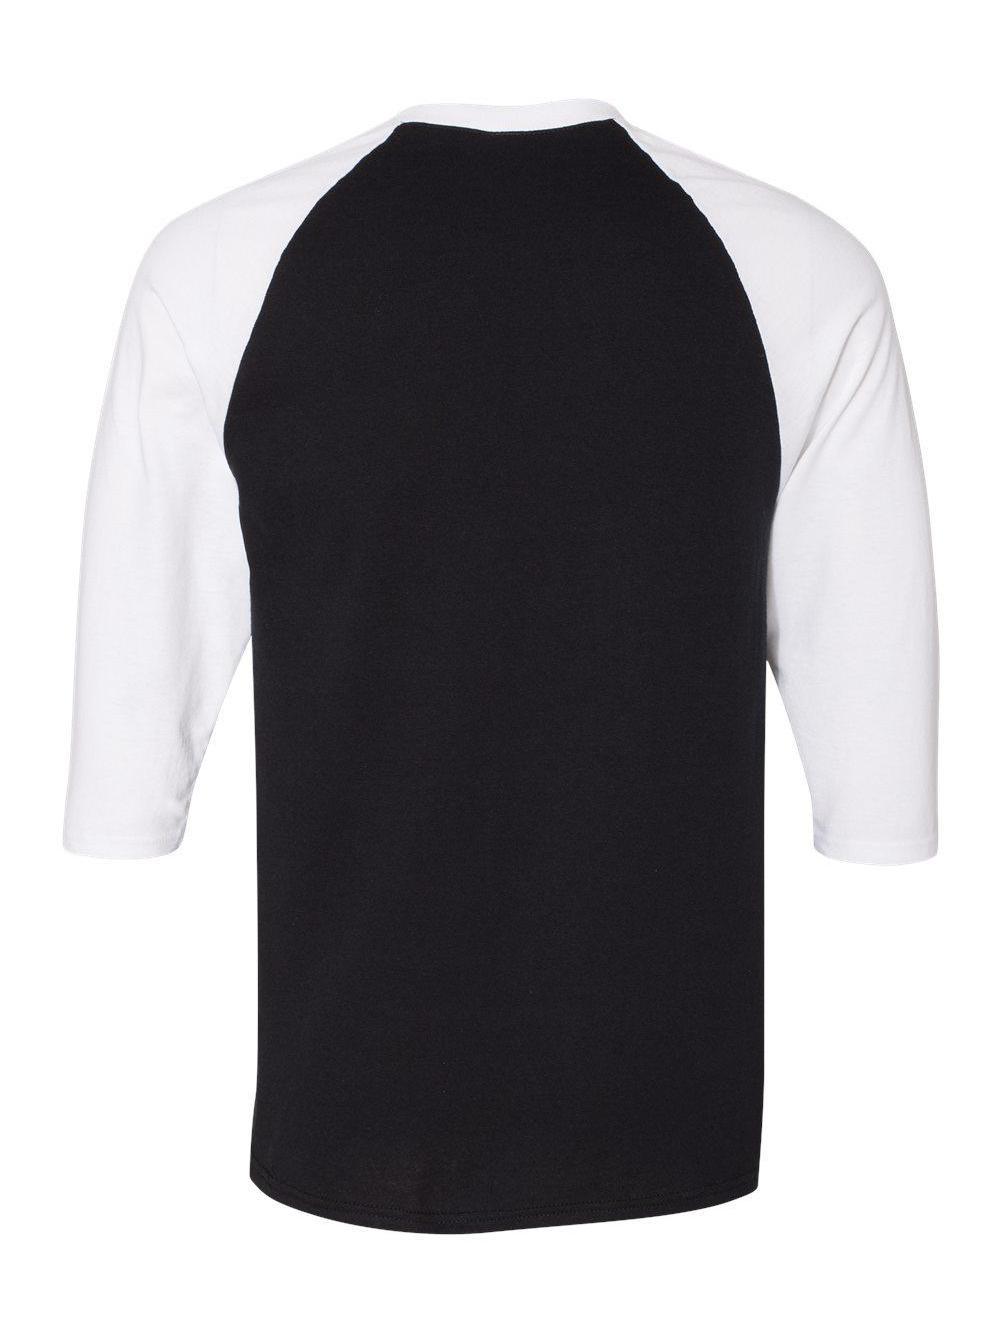 Gildan-Heavy-Cotton-Three-Quarter-Raglan-Sleeve-Baseball-T-Shirt-5700 thumbnail 4